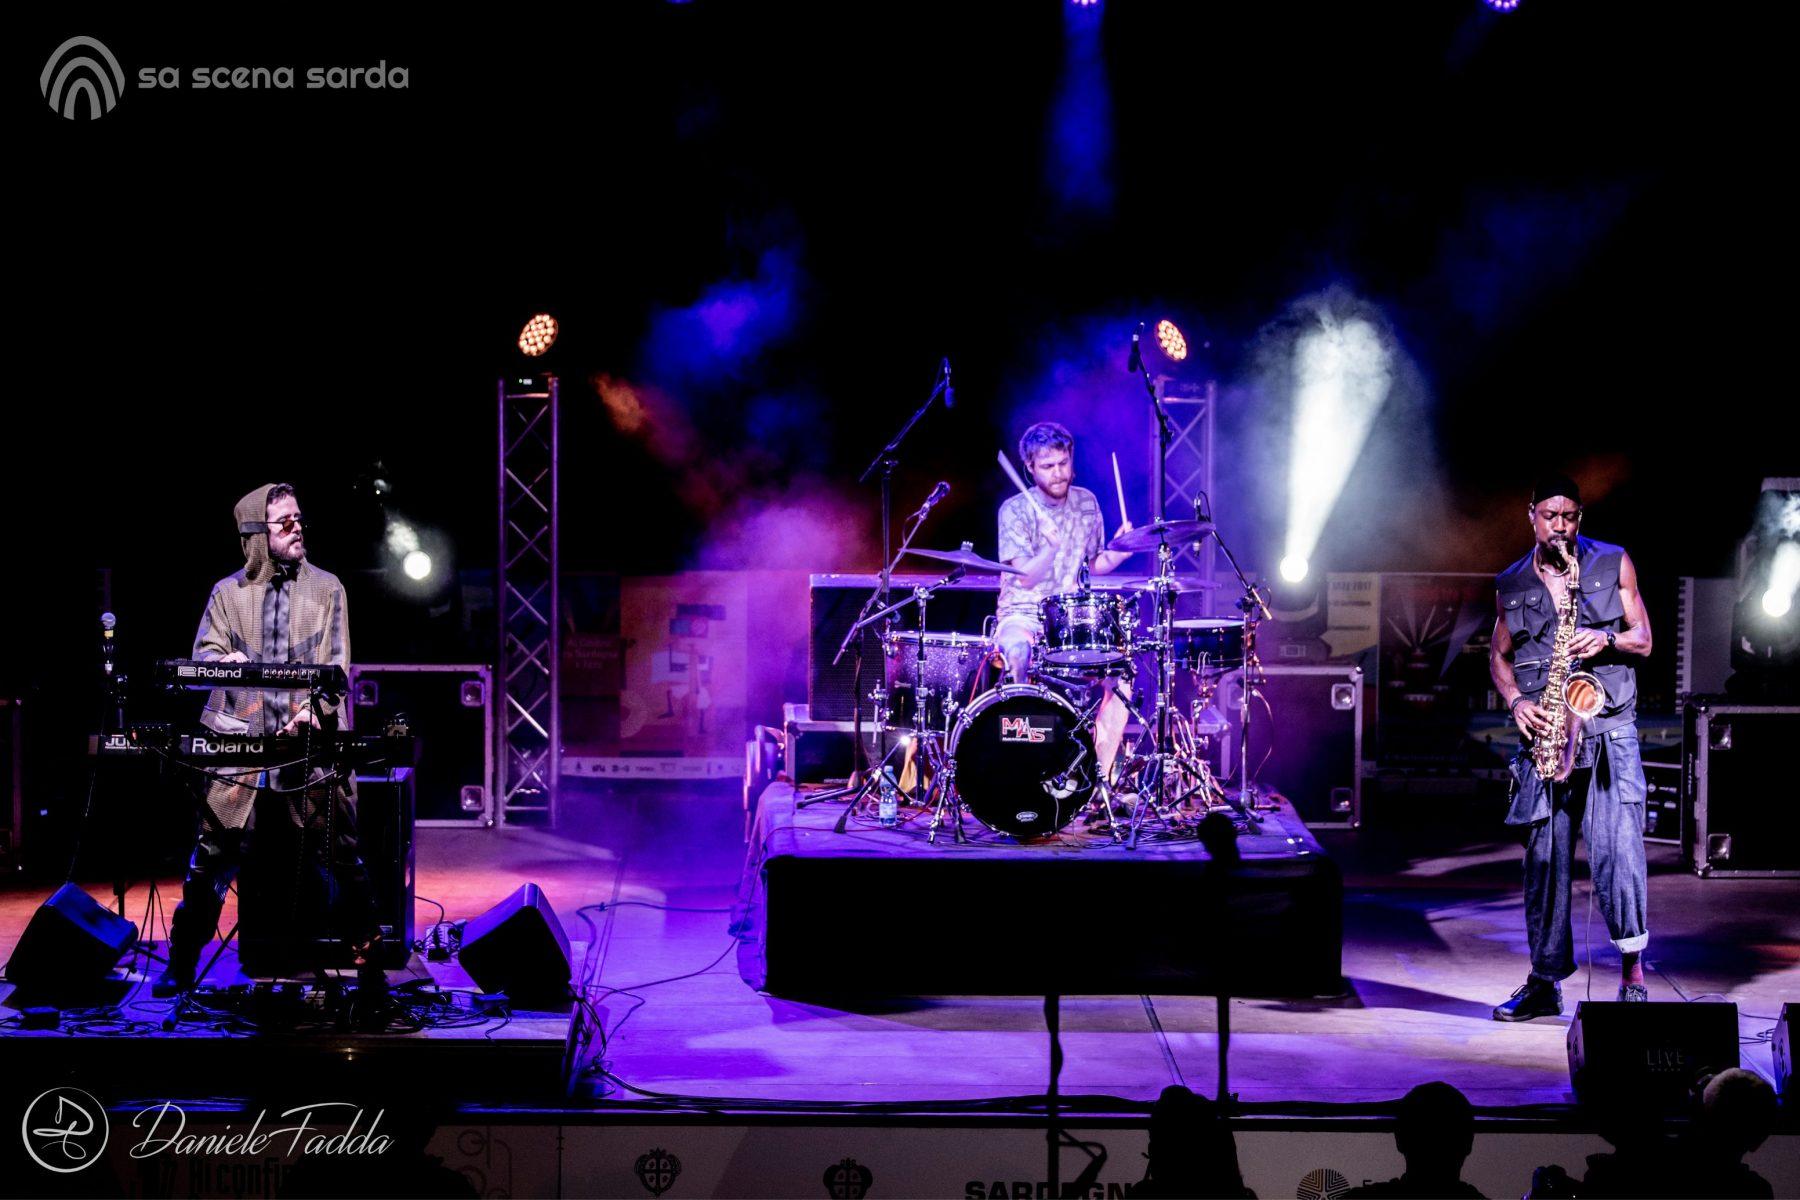 Ai Confini tra Sardegna e Jazz - Sant'Anna Arresi Jazz Festival - The Comet is Coming - Daniele Fadda - foto report - Sant'Anna Arresi - festival- 2020 - Sa Scena Sarda - 05 Settembre 2020